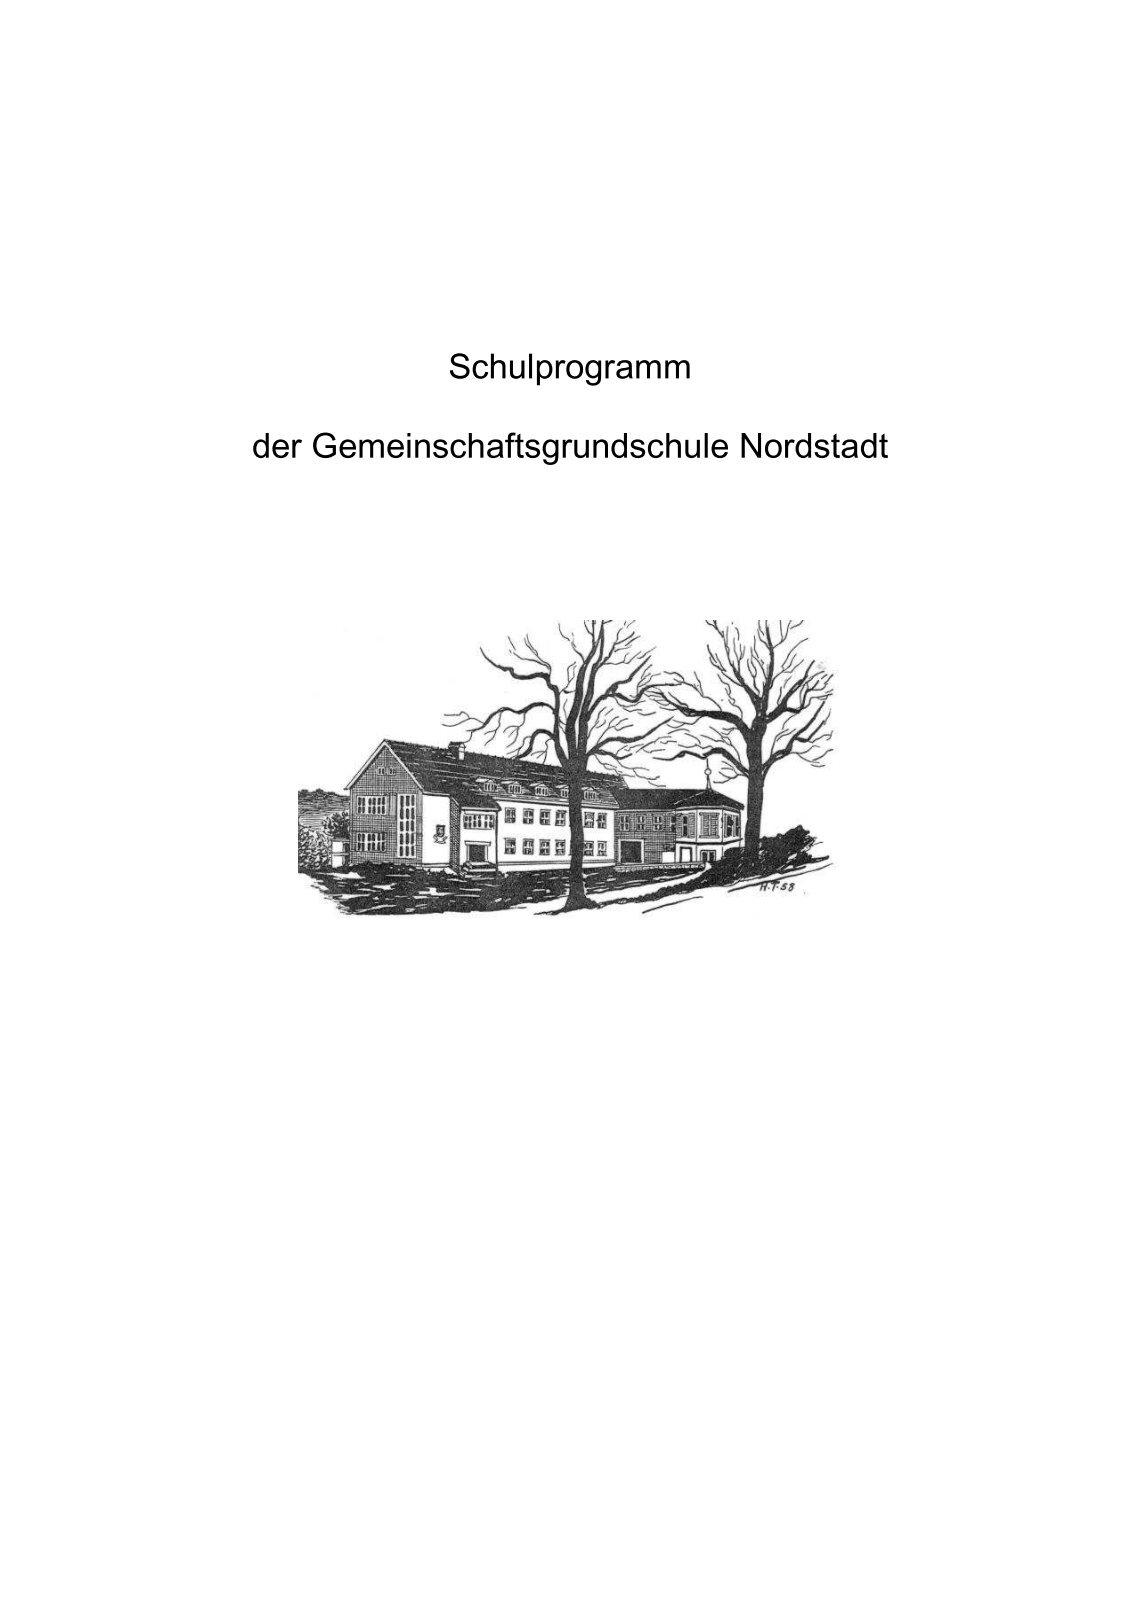 1 free Magazines from GRUNDSCHULENORDSTADT